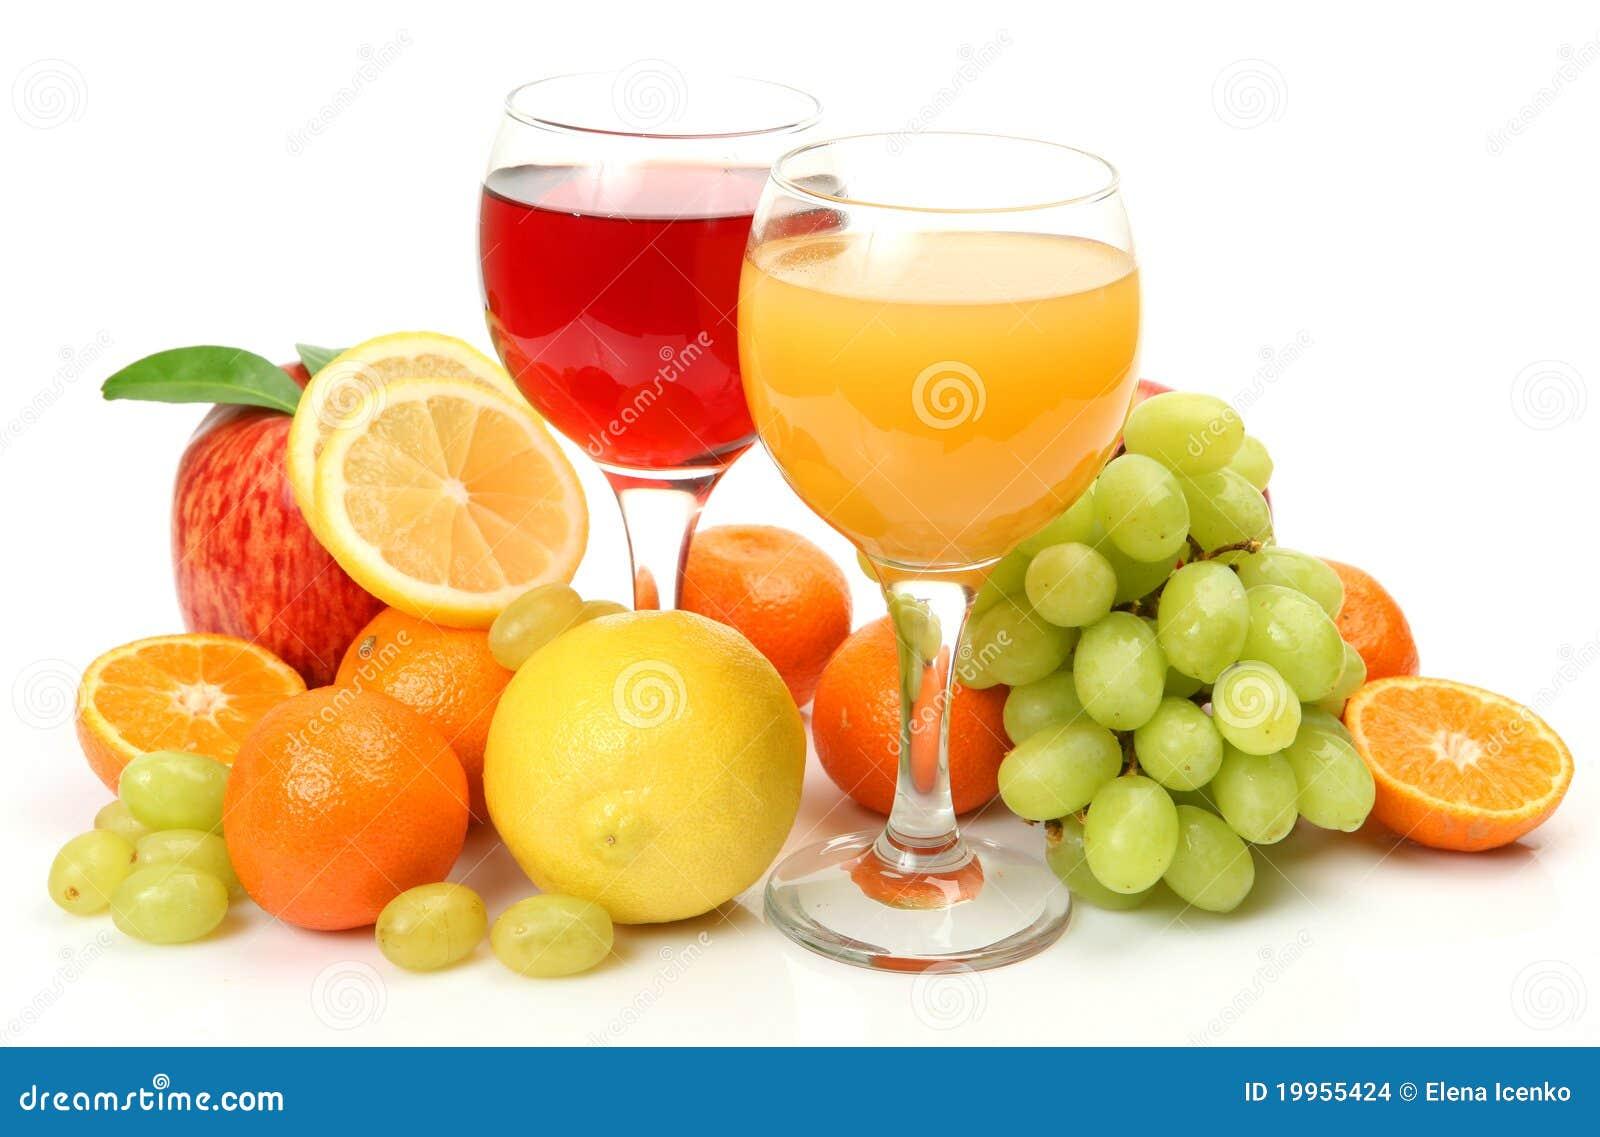 fresh fruit and juice stock photo image of liquid citron 19955424